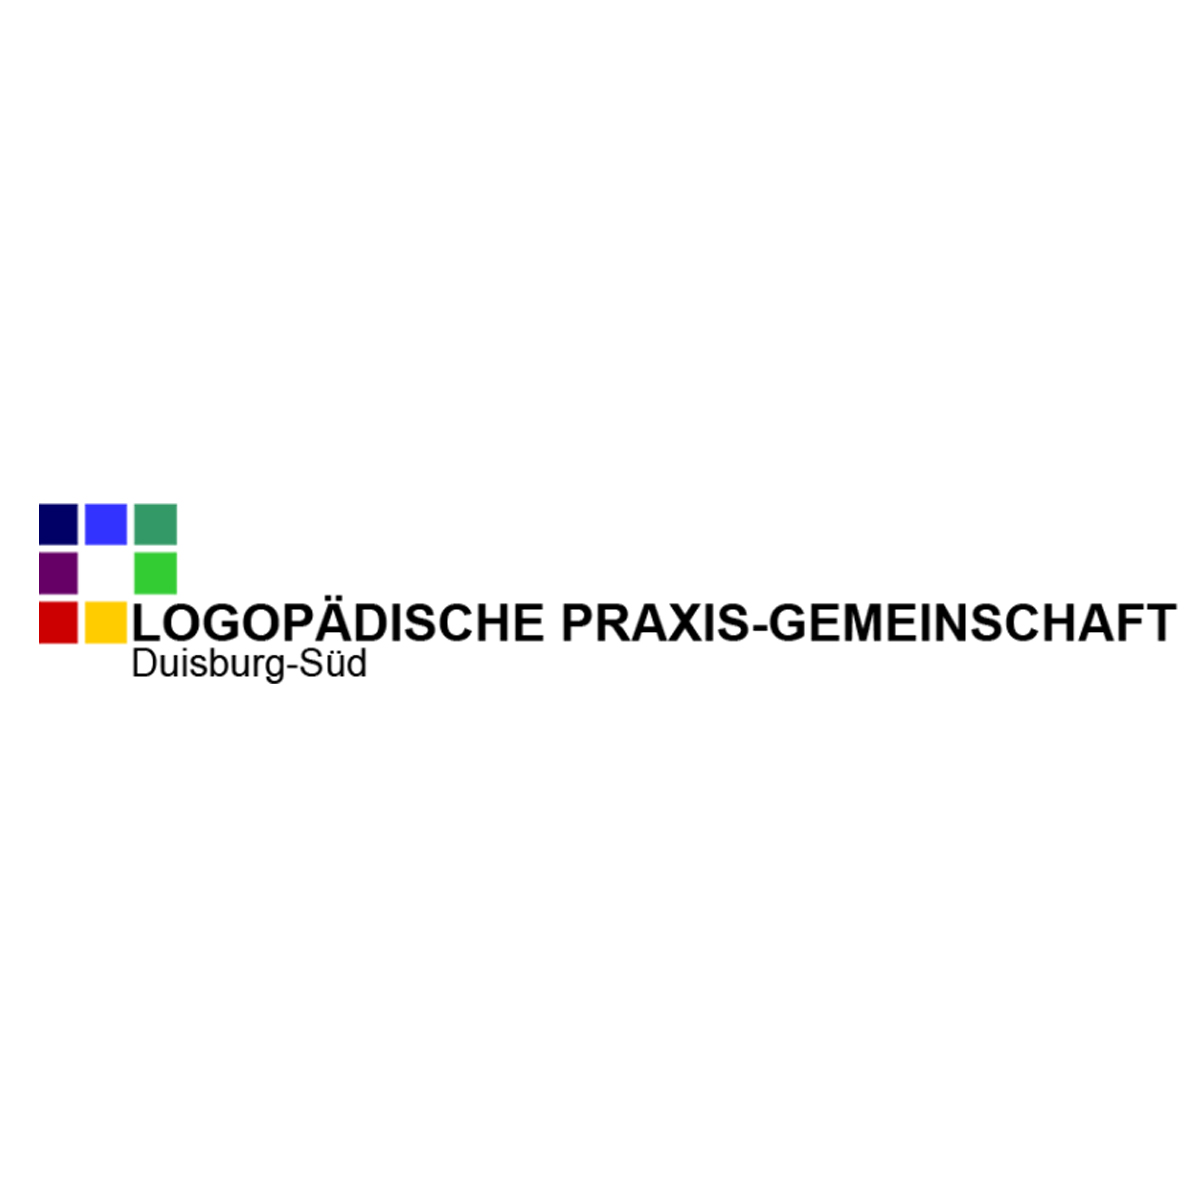 Bild zu Logopädische Praxisgemeinschaft Duisburg Süd in Duisburg